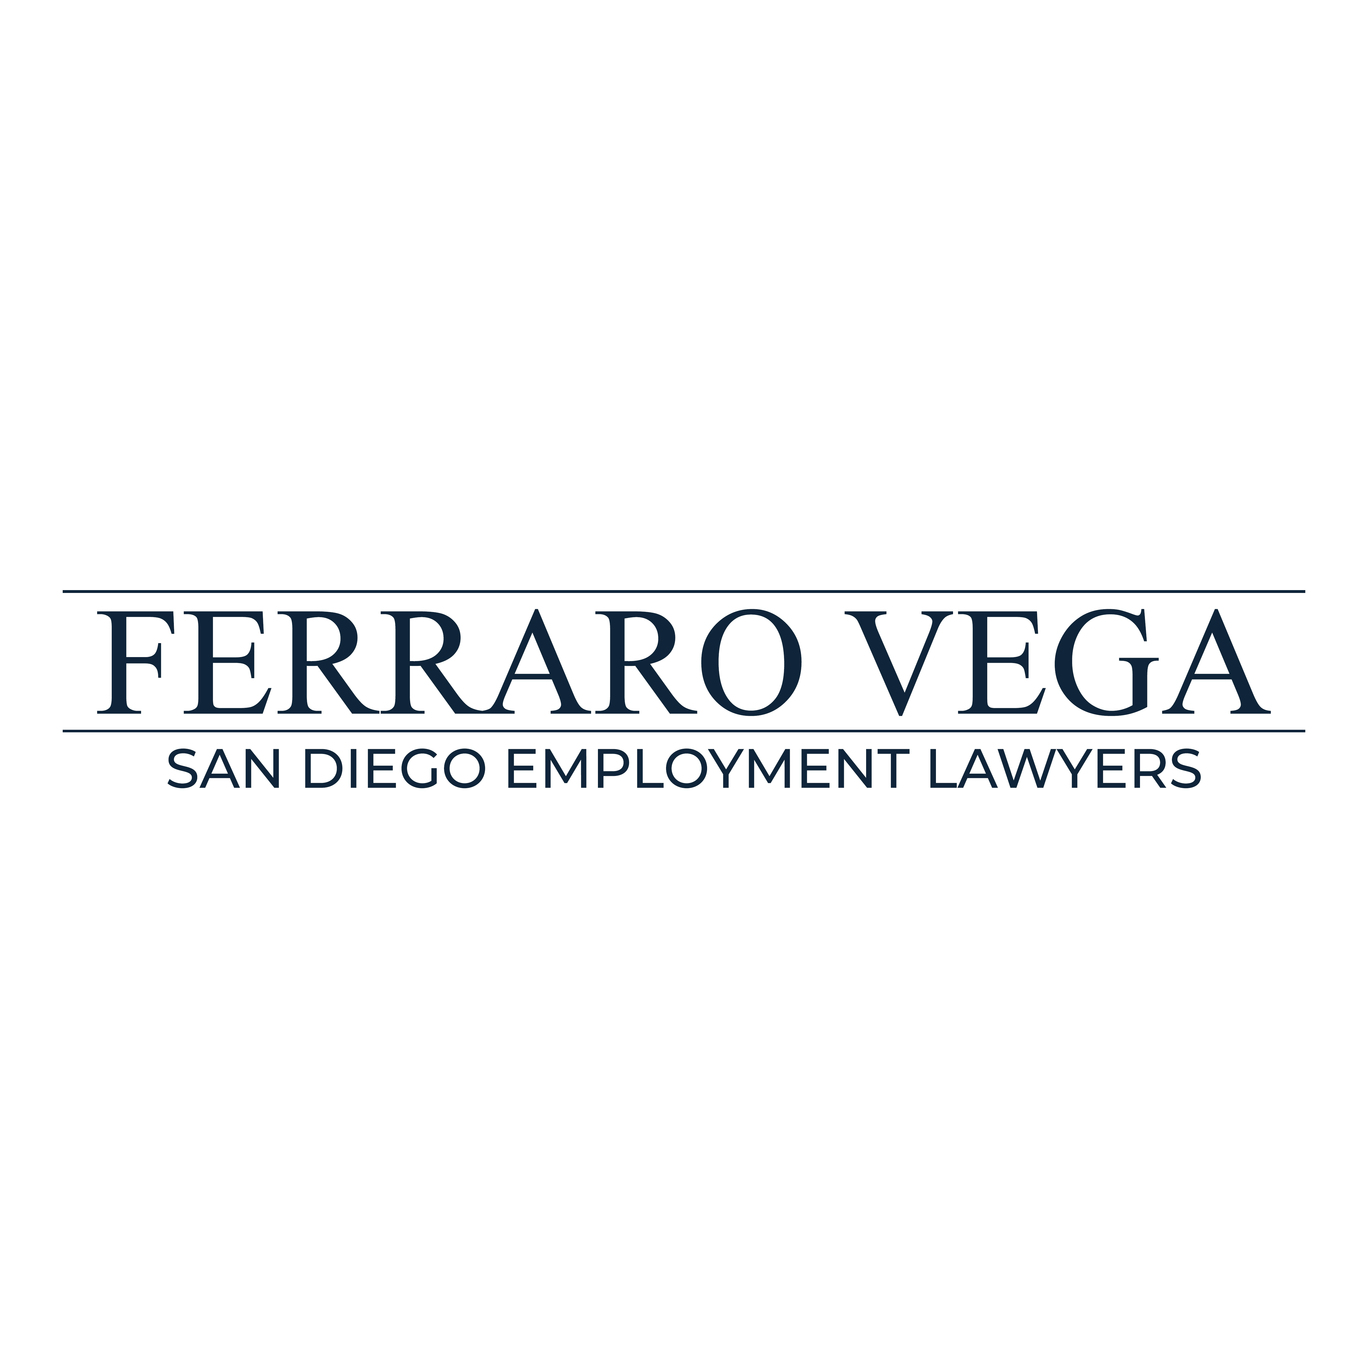 Ferraro Vega San Diego Employment Lawyers